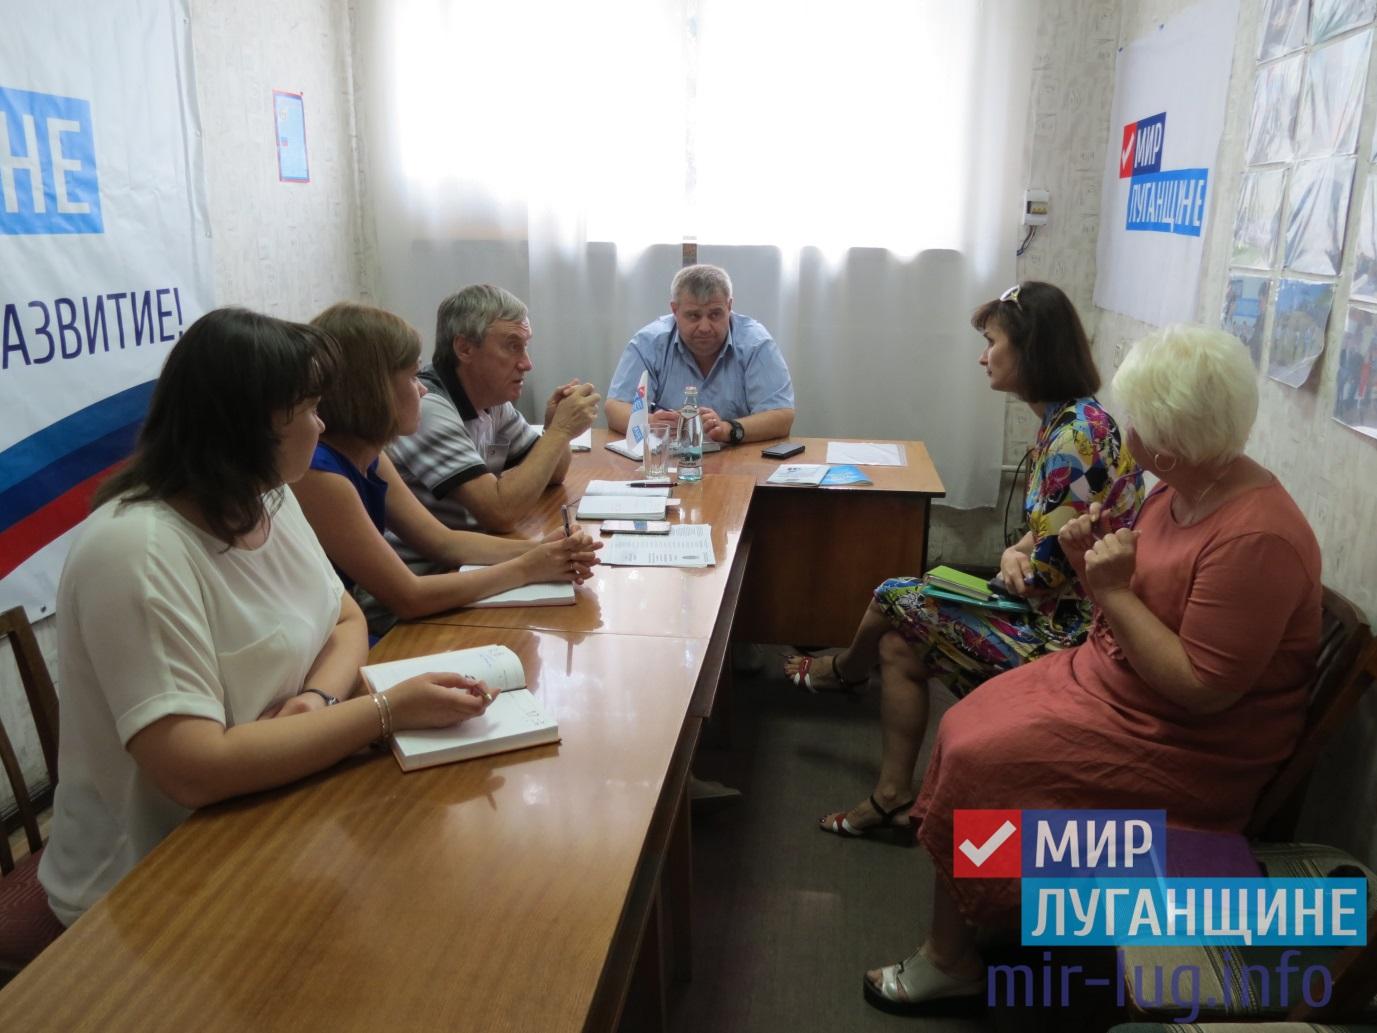 Представитель Министерства юстиции ЛНР встретился со структурами Брянковского управления юстиции 1